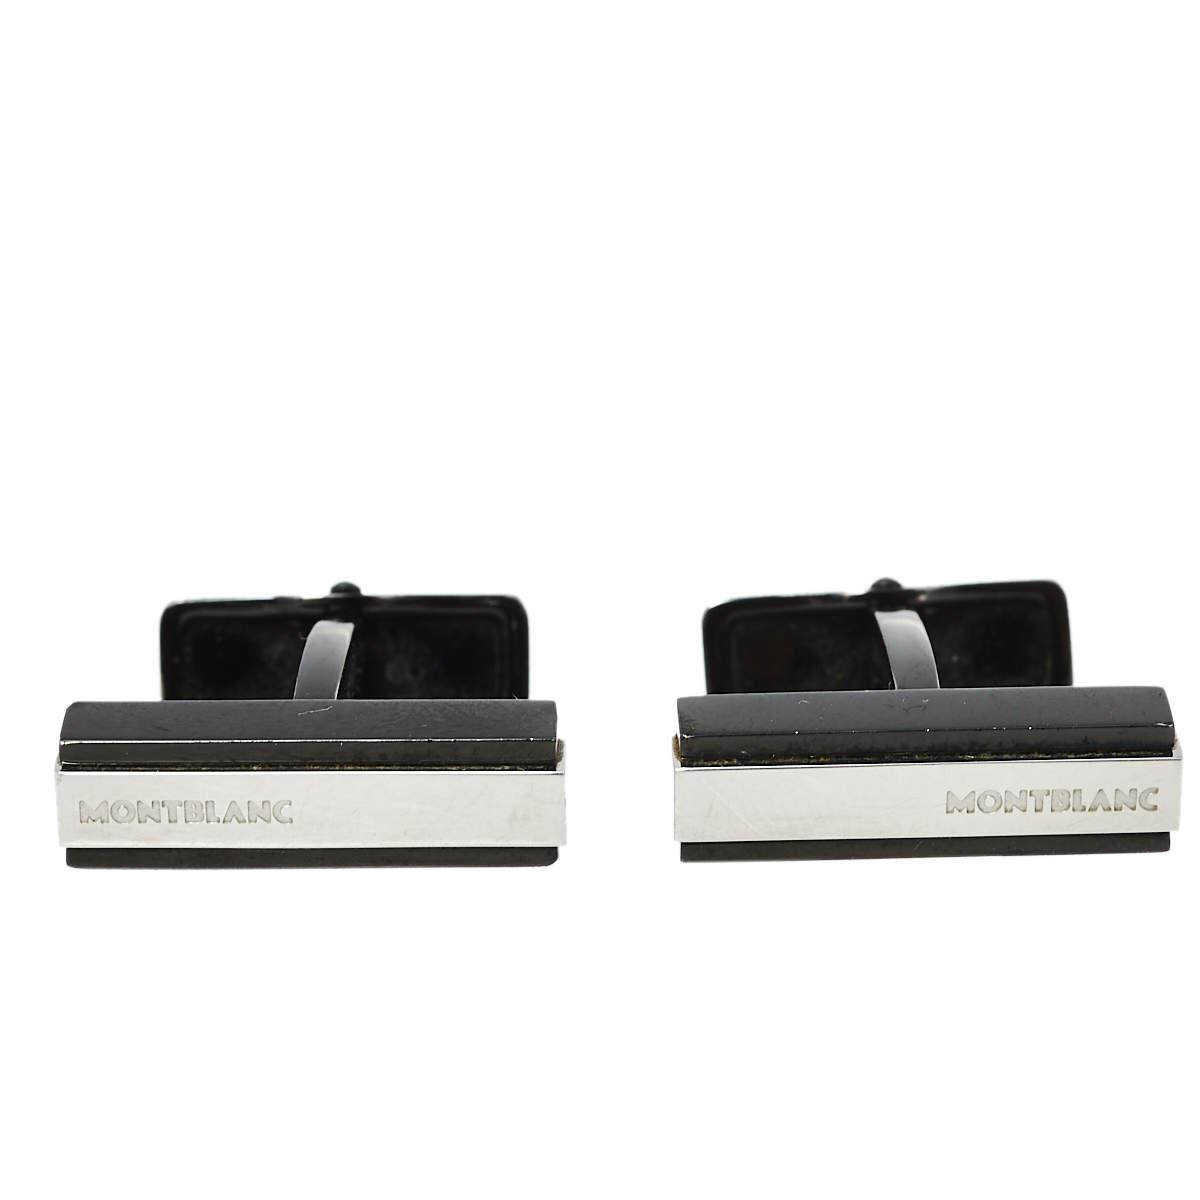 Montblanc Iconic Black PVD Steel Cufflinks